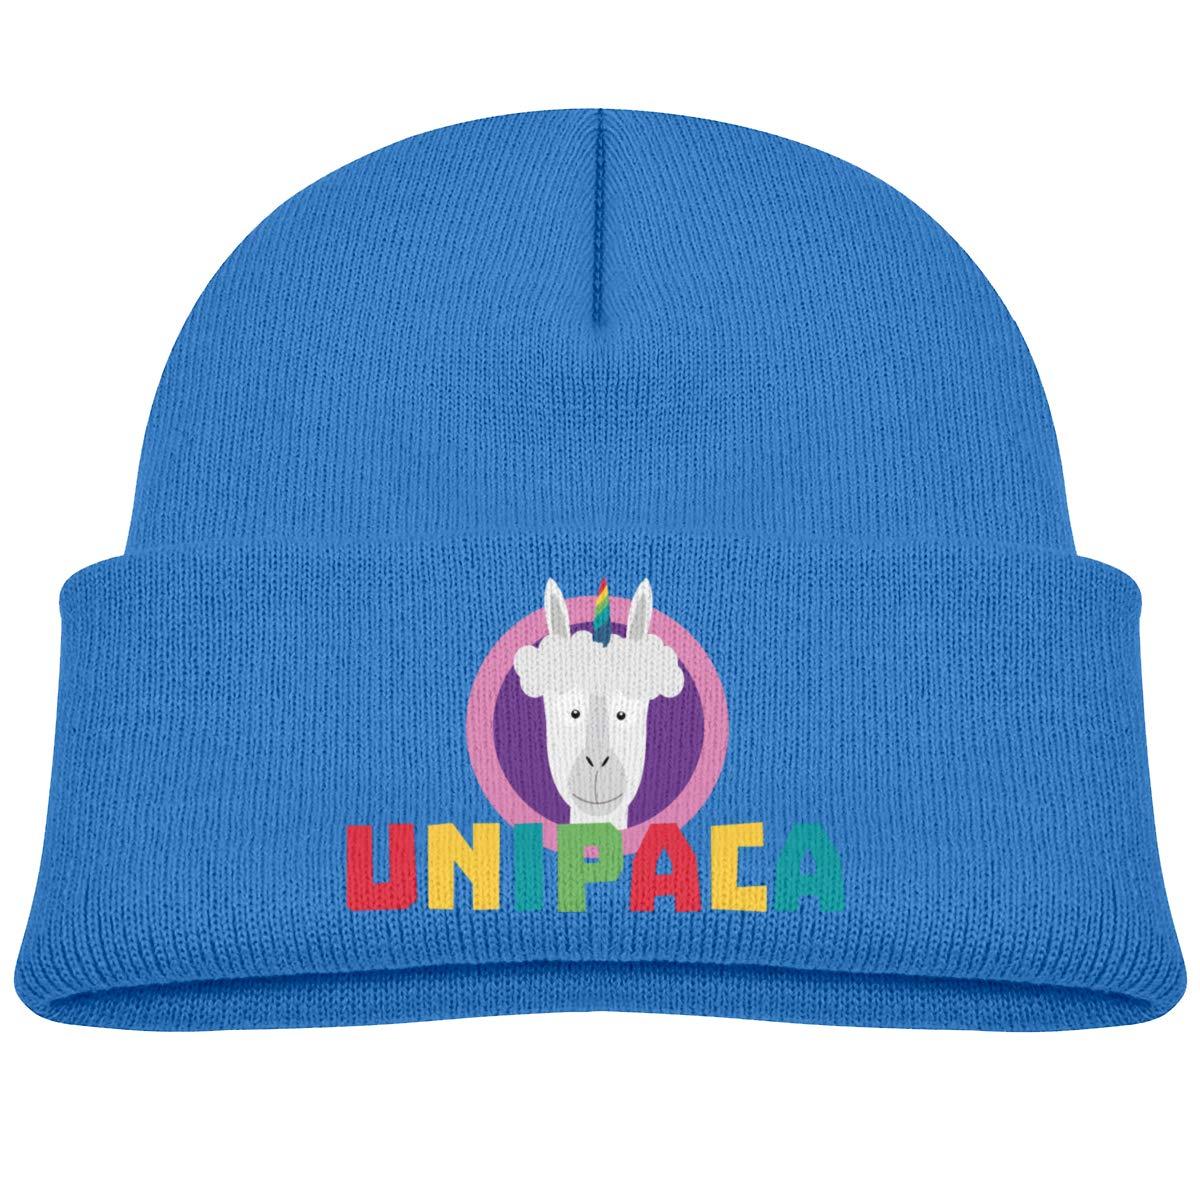 Unipaca Unicorn Infant Knit Hat Baby Boys Beanie Cap